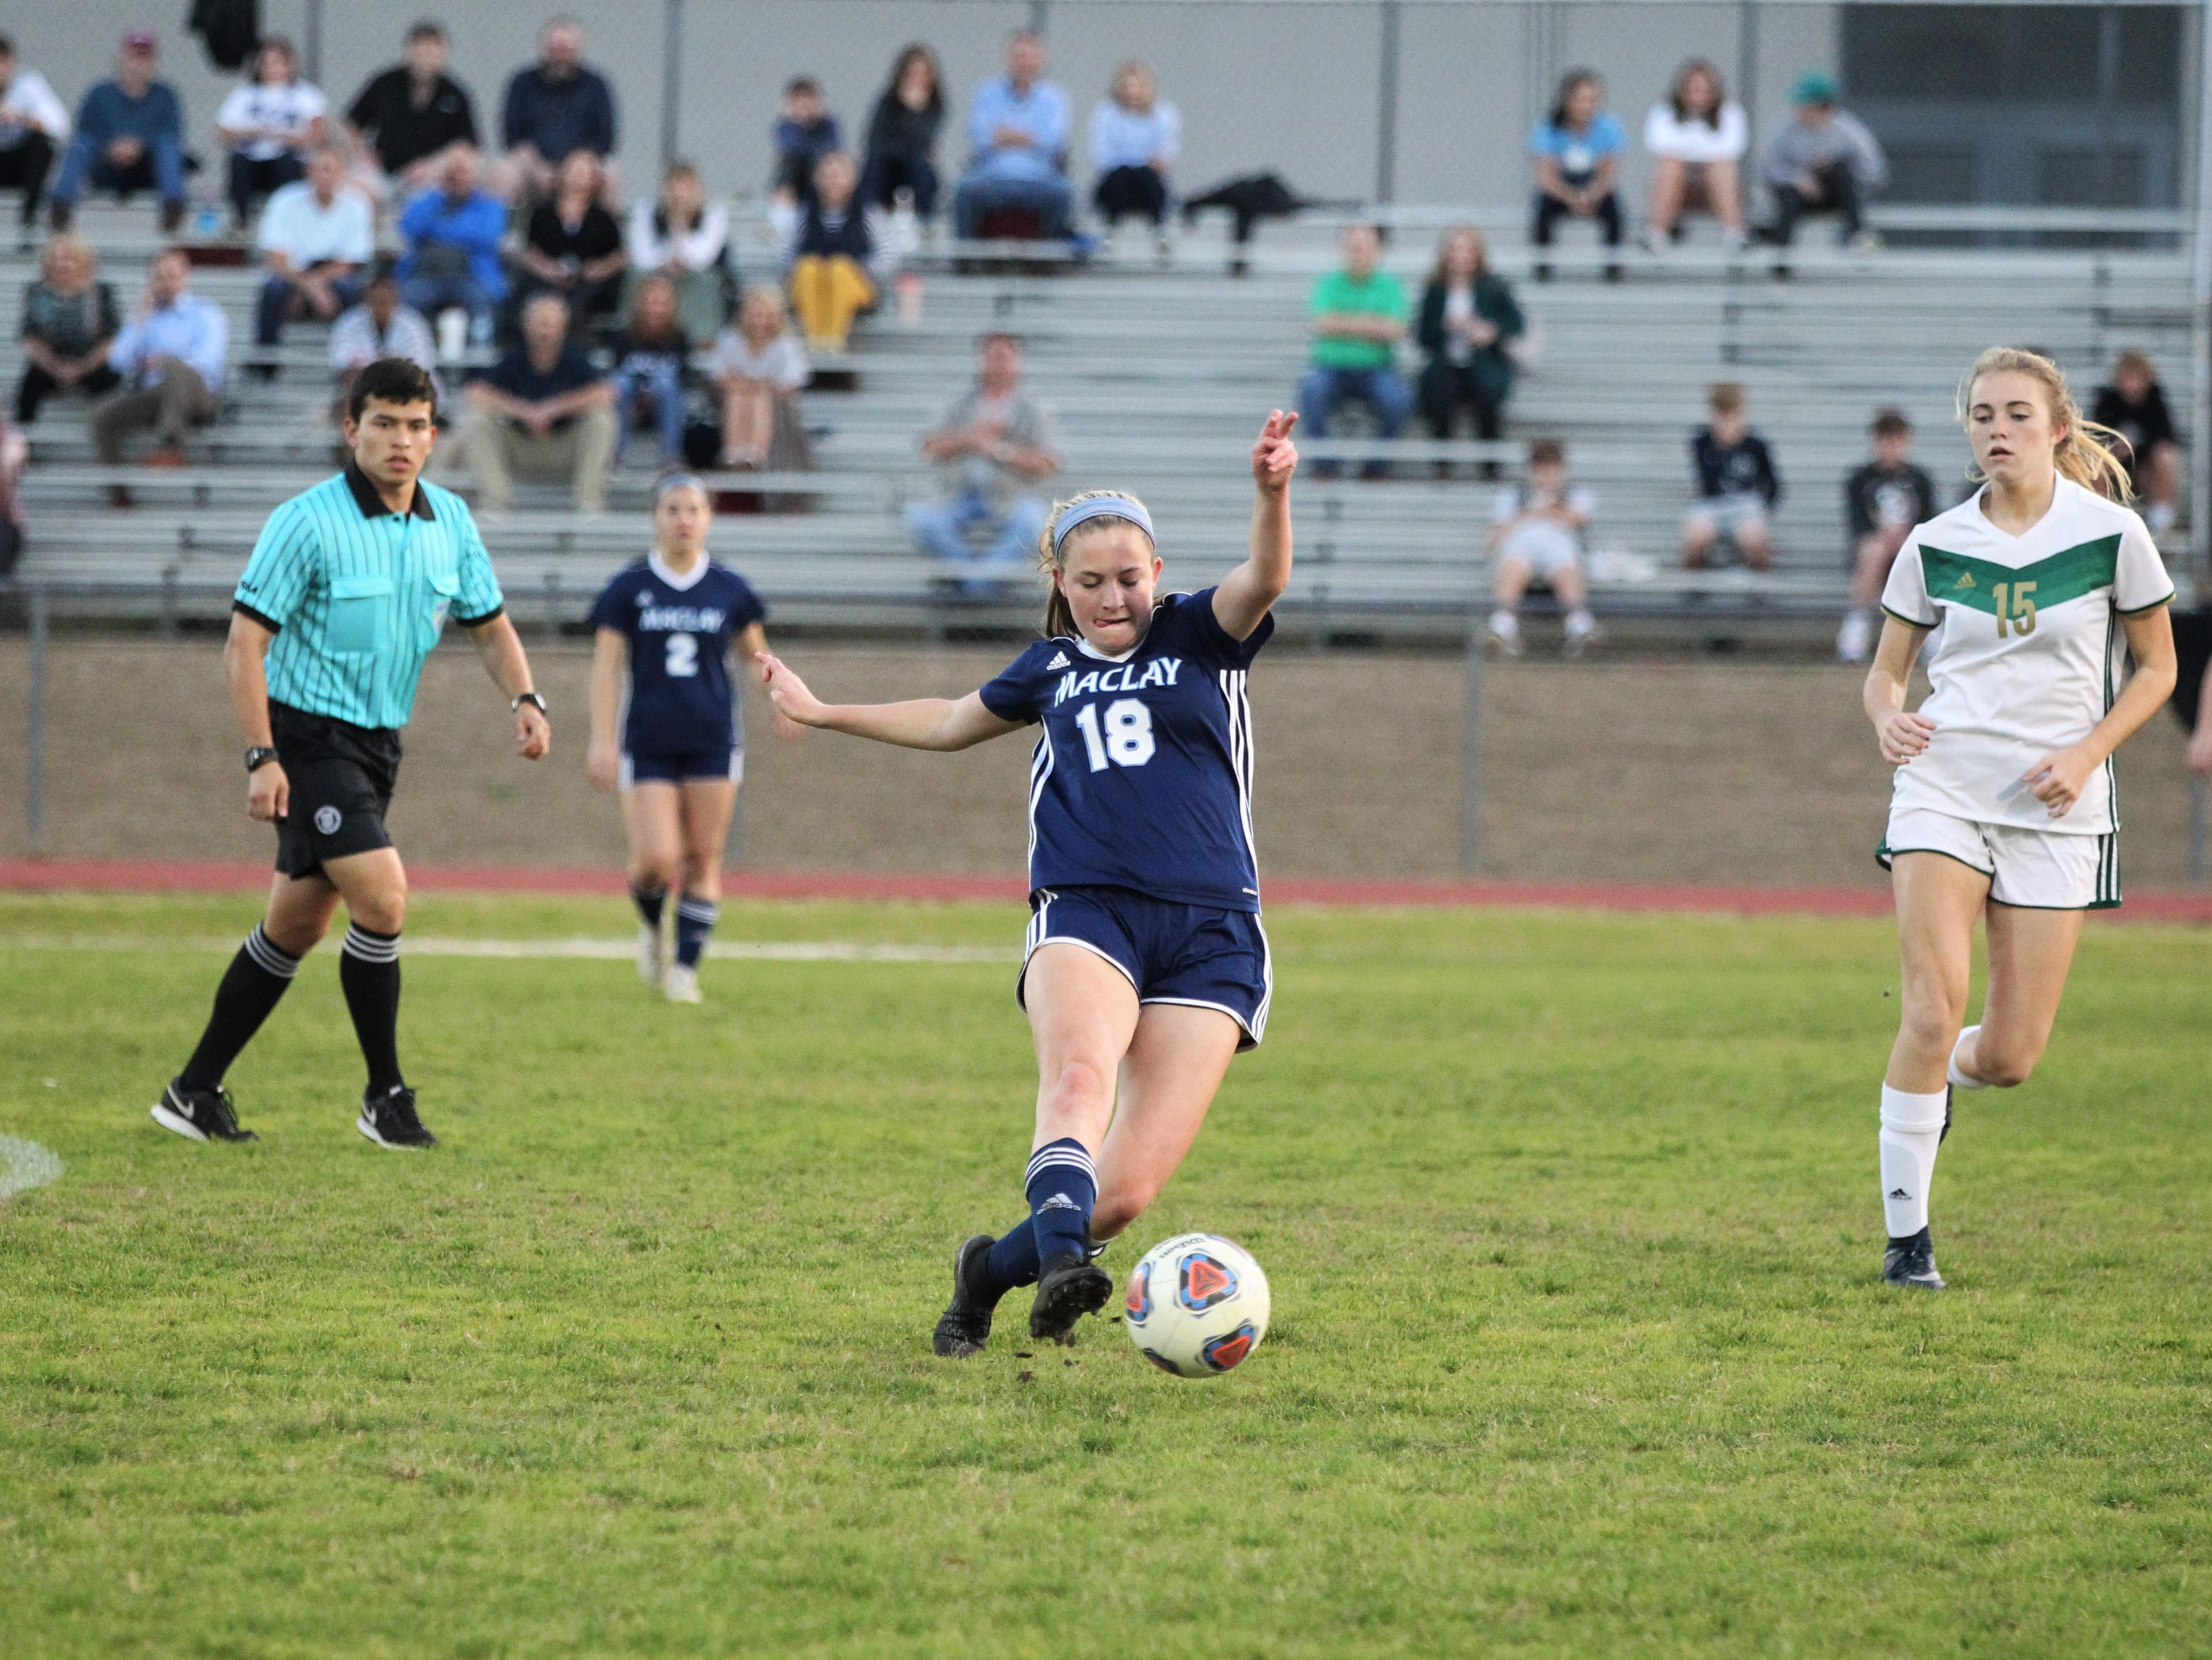 Maclay's Avery Smith passes upfield as Maclay's girls soccer team beat St. Joseph Academy 4-0 in a Region 1-1A quarterfinal on Jan. 5, 2019.